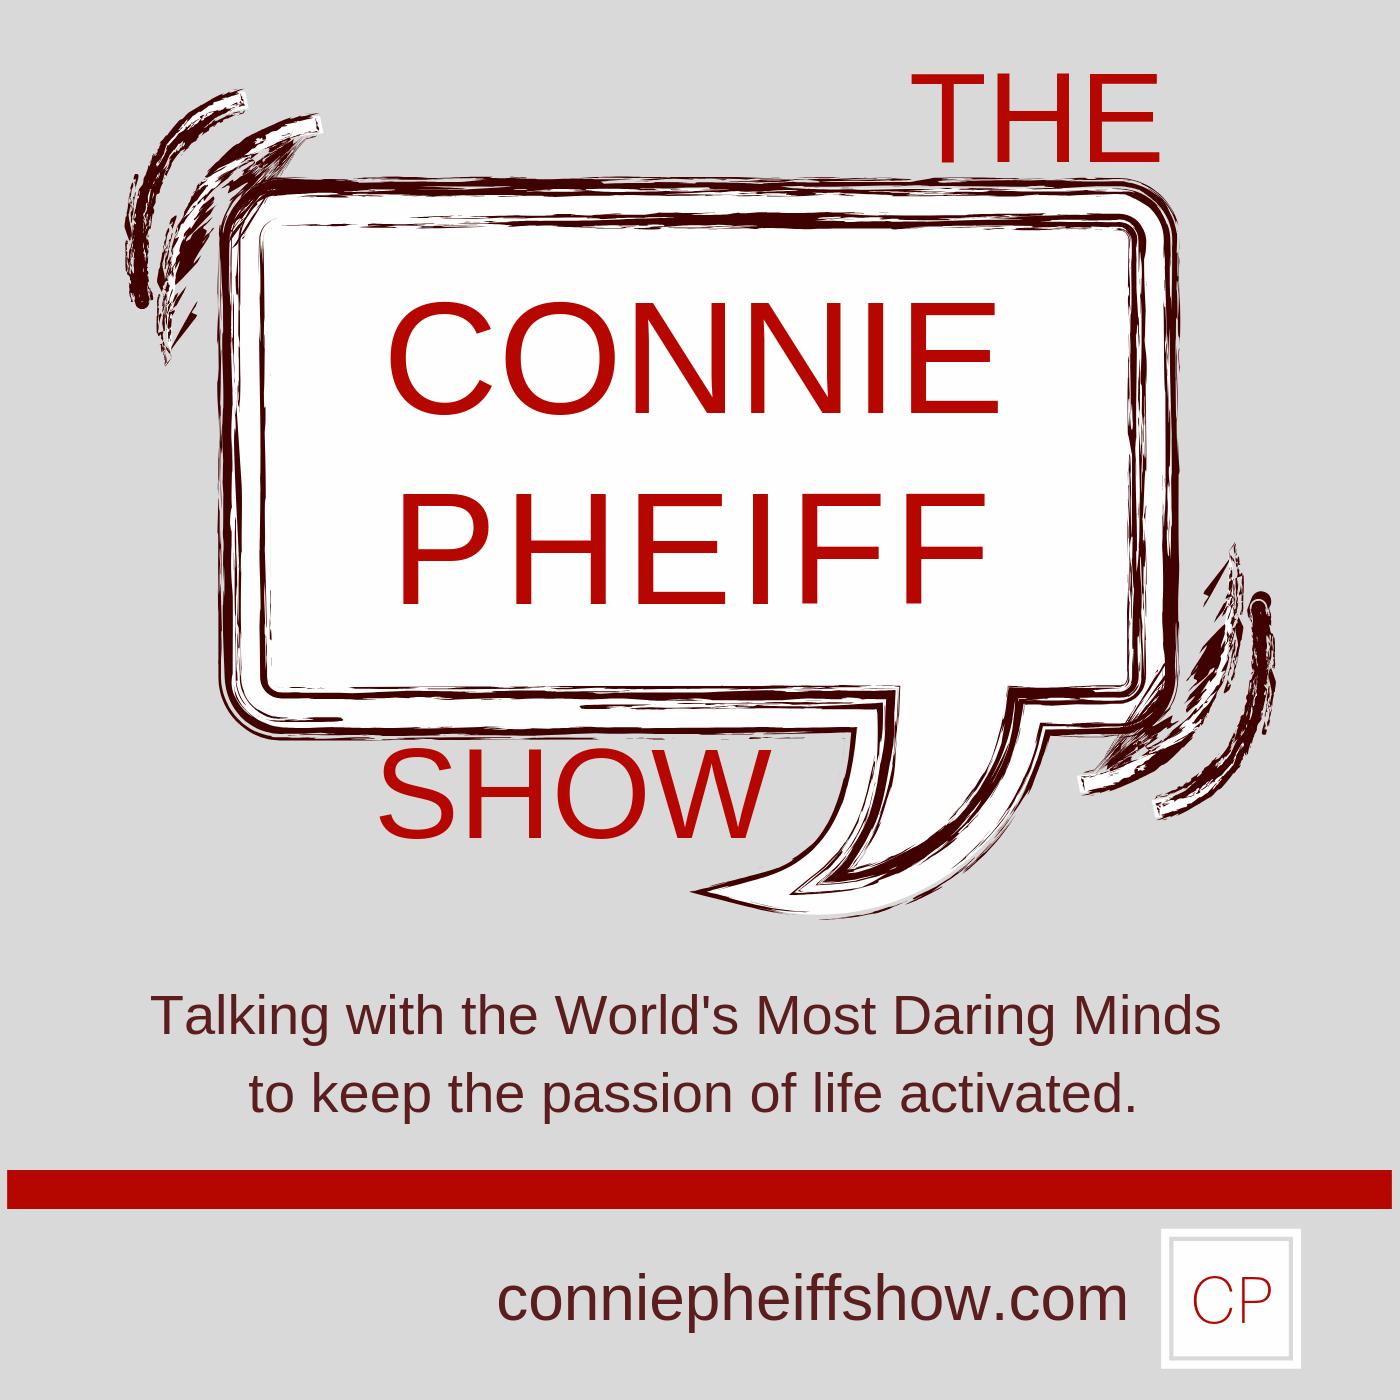 Connie Pheiff Show